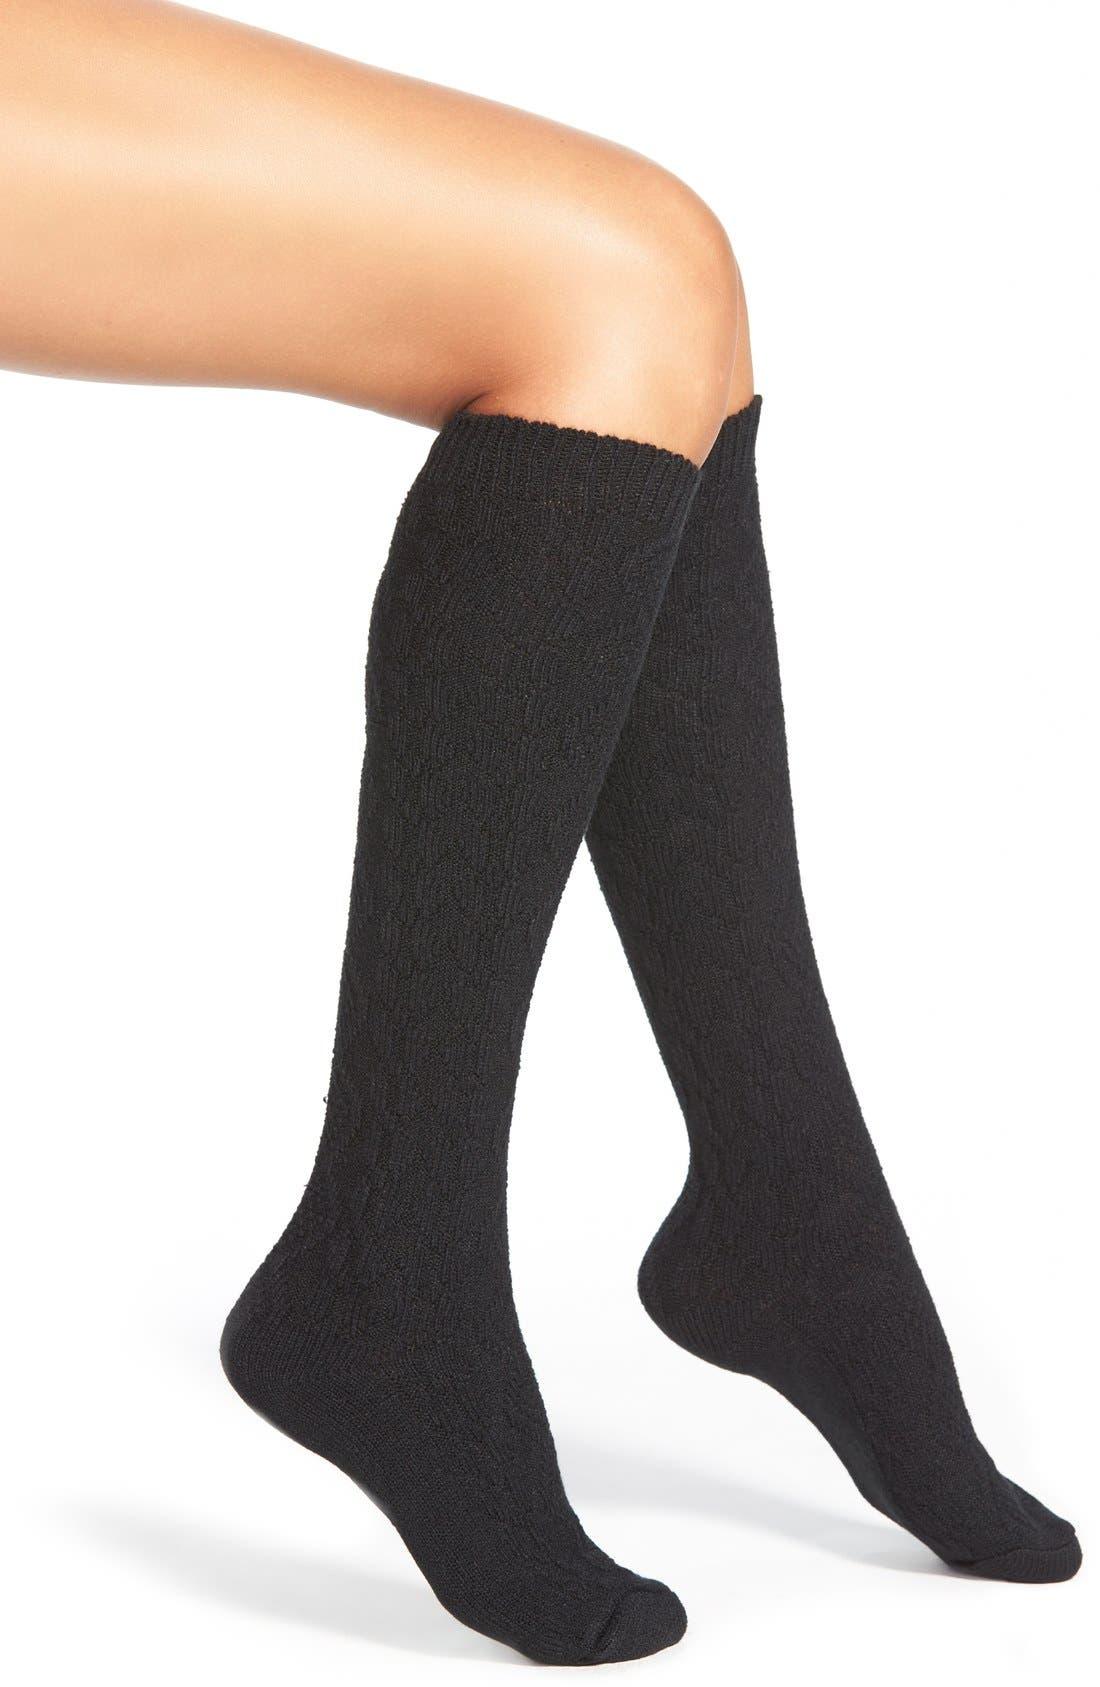 Alternate Image 1 Selected - Hue 'Fisherman' Cable Knit Knee High Socks